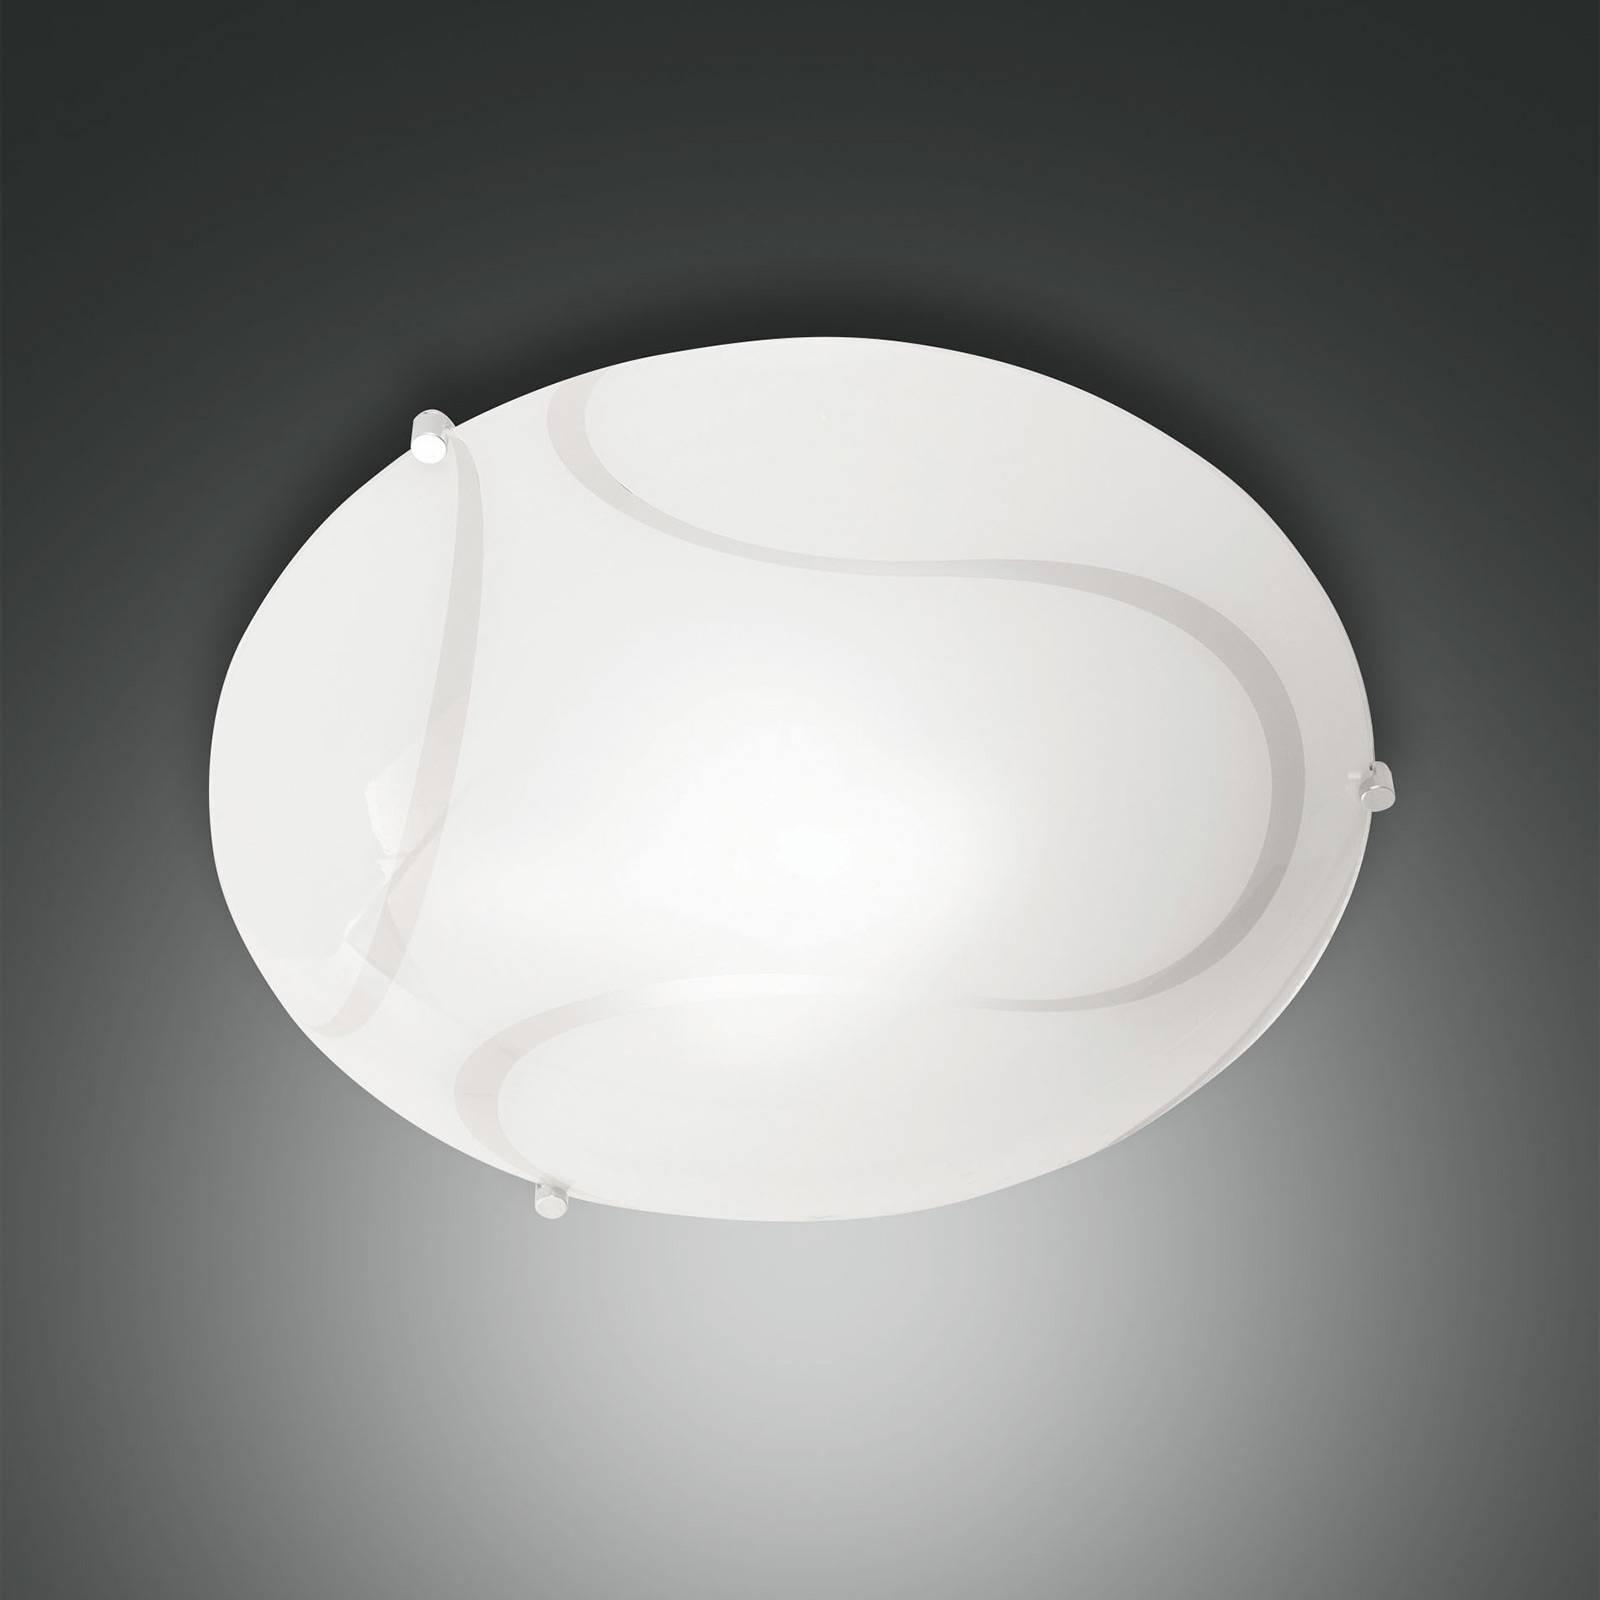 Plafondlamp Magma van glas, 40 cm